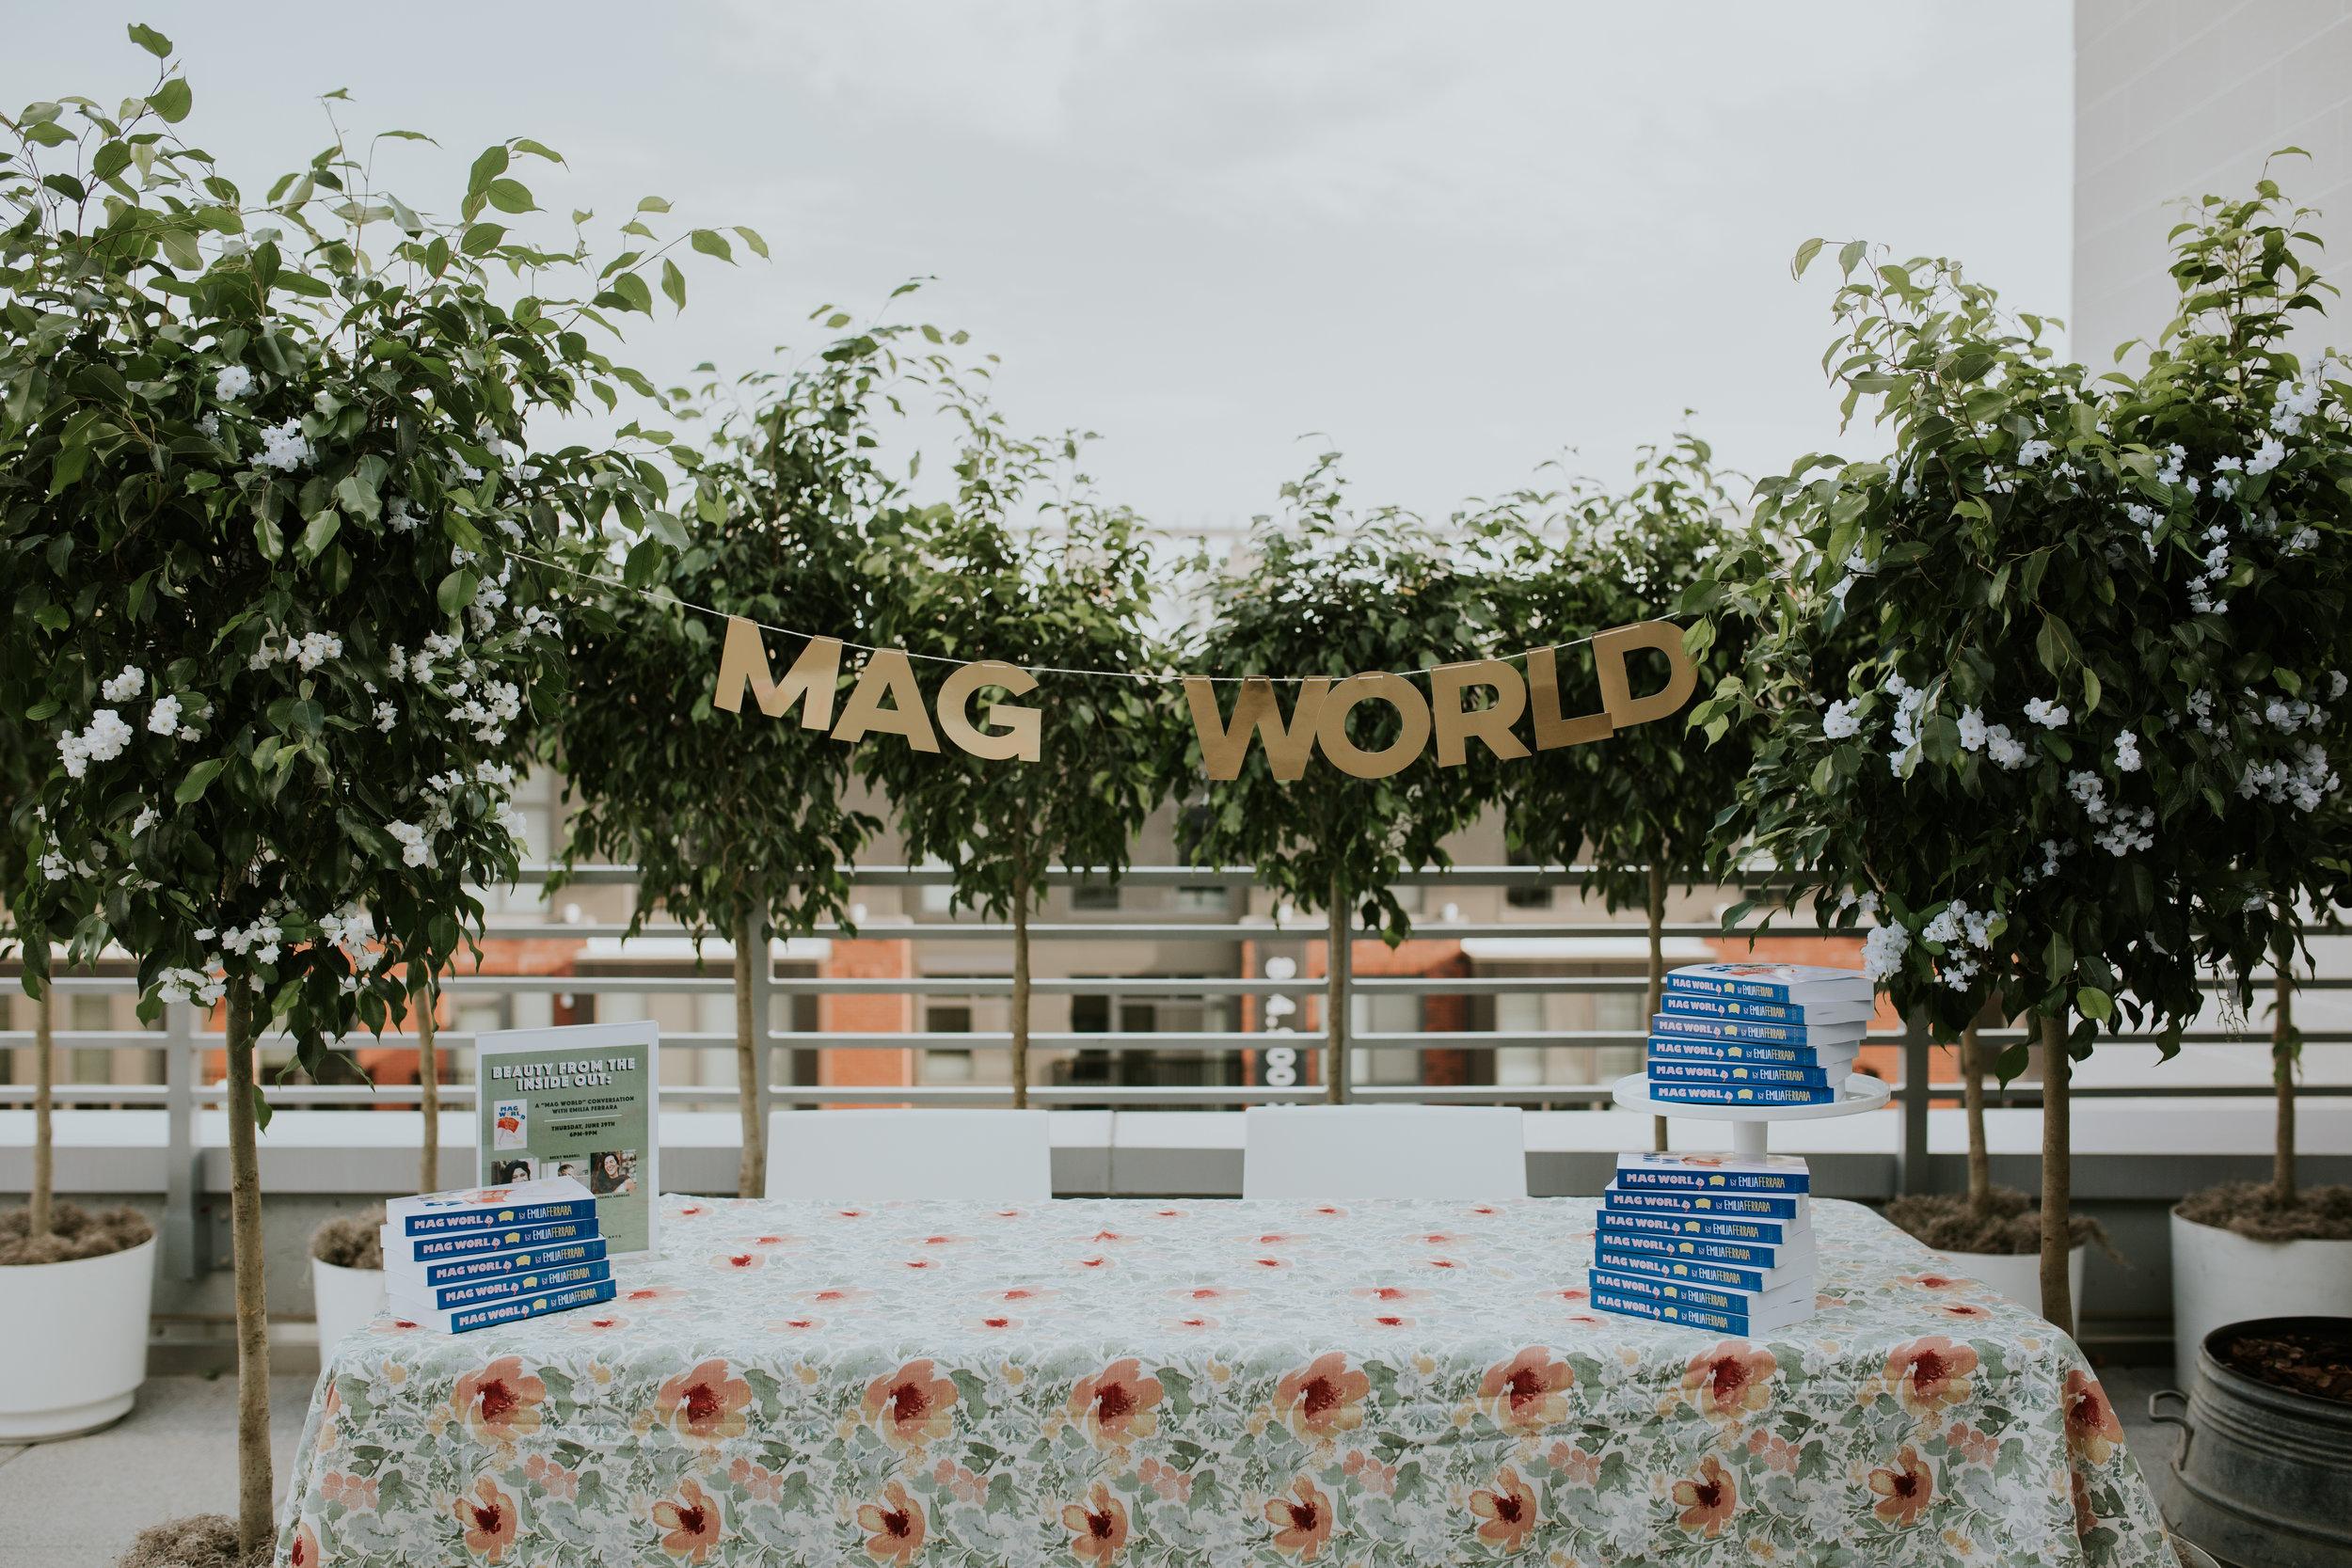 mag-world-apollo-event-32.jpg